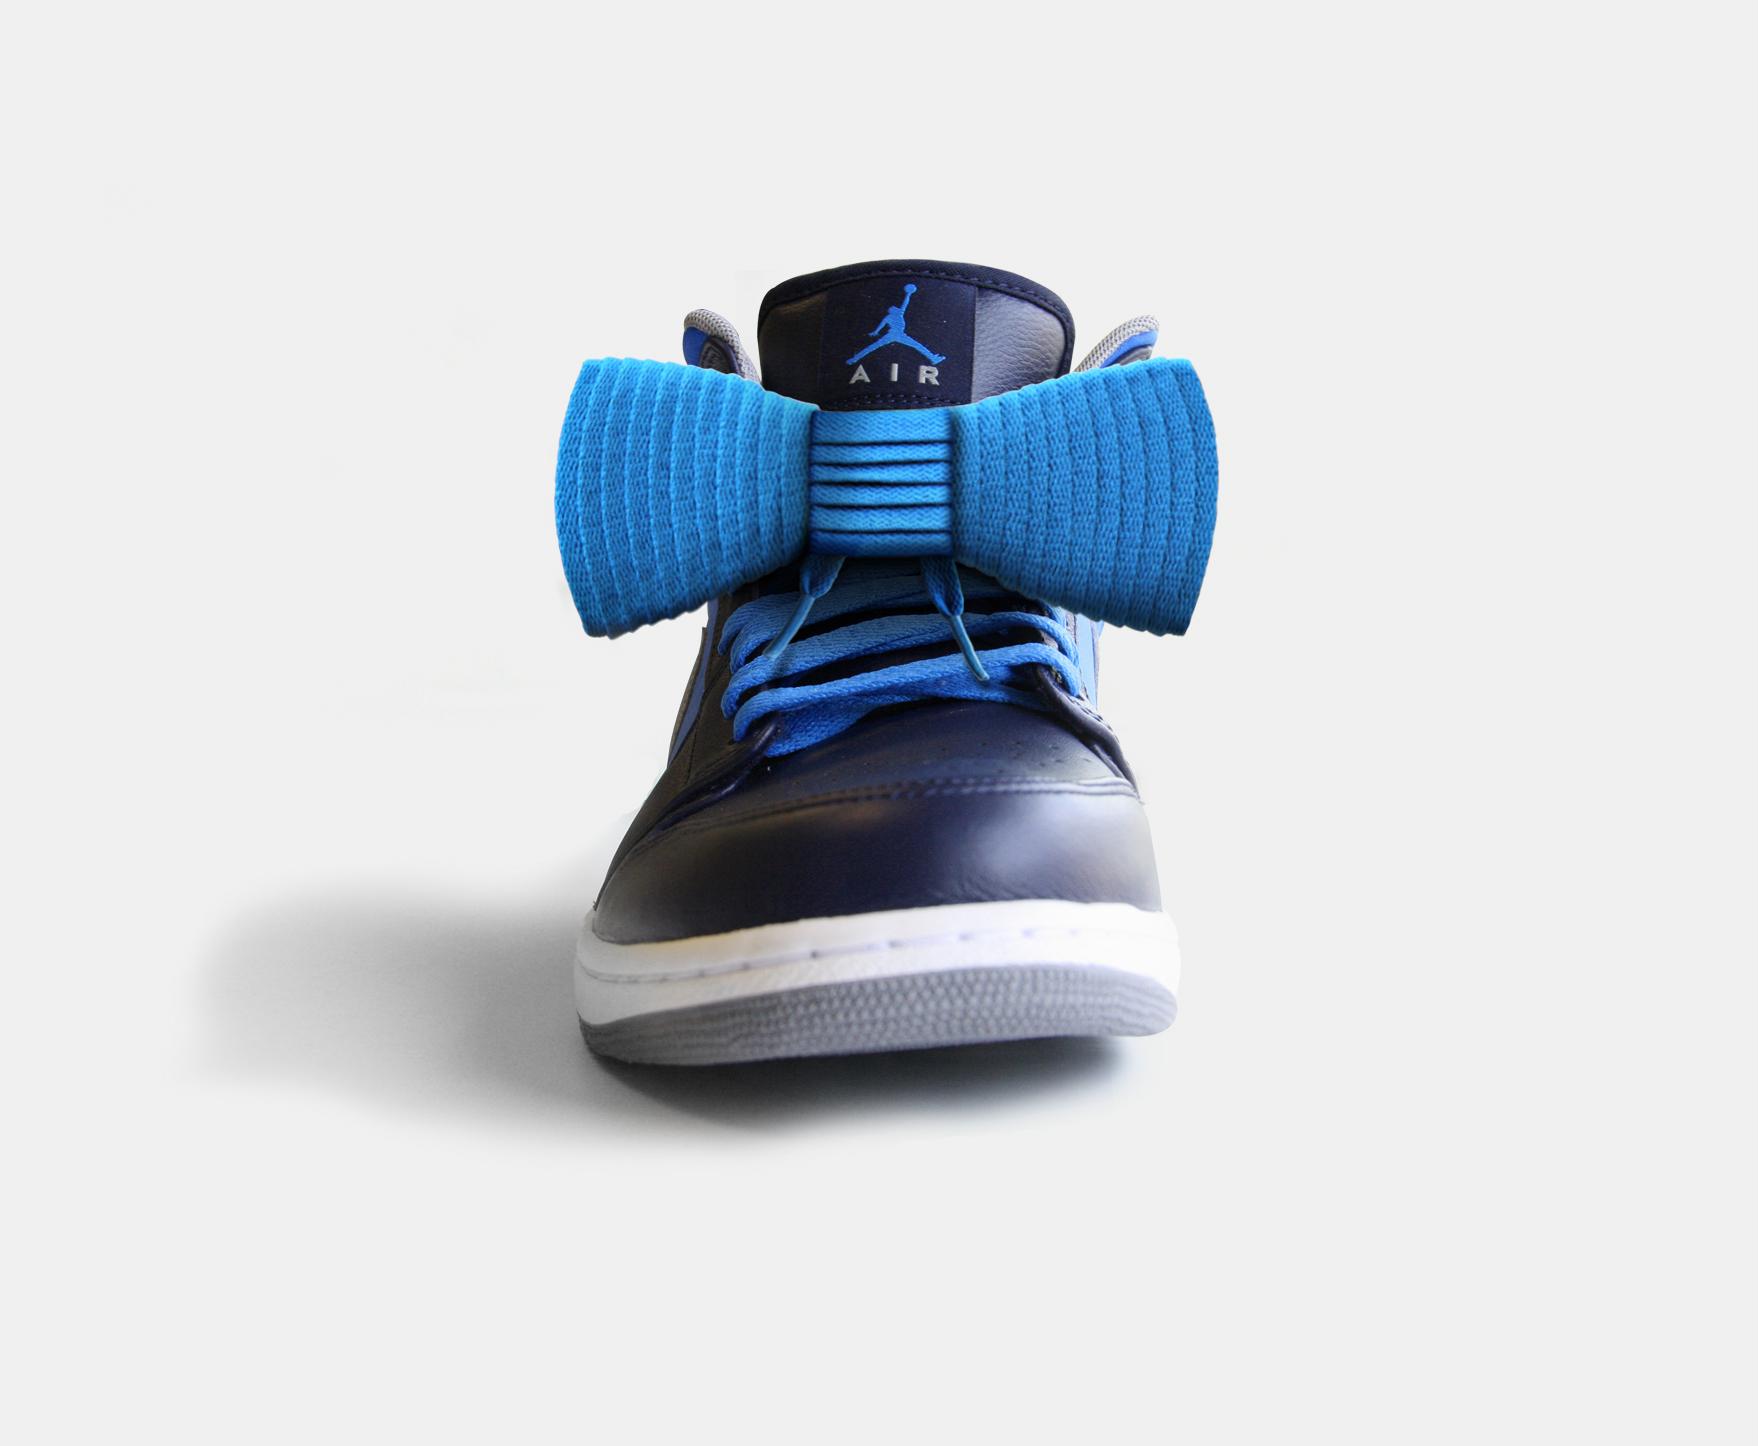 shoe_with_bowtie.jpg